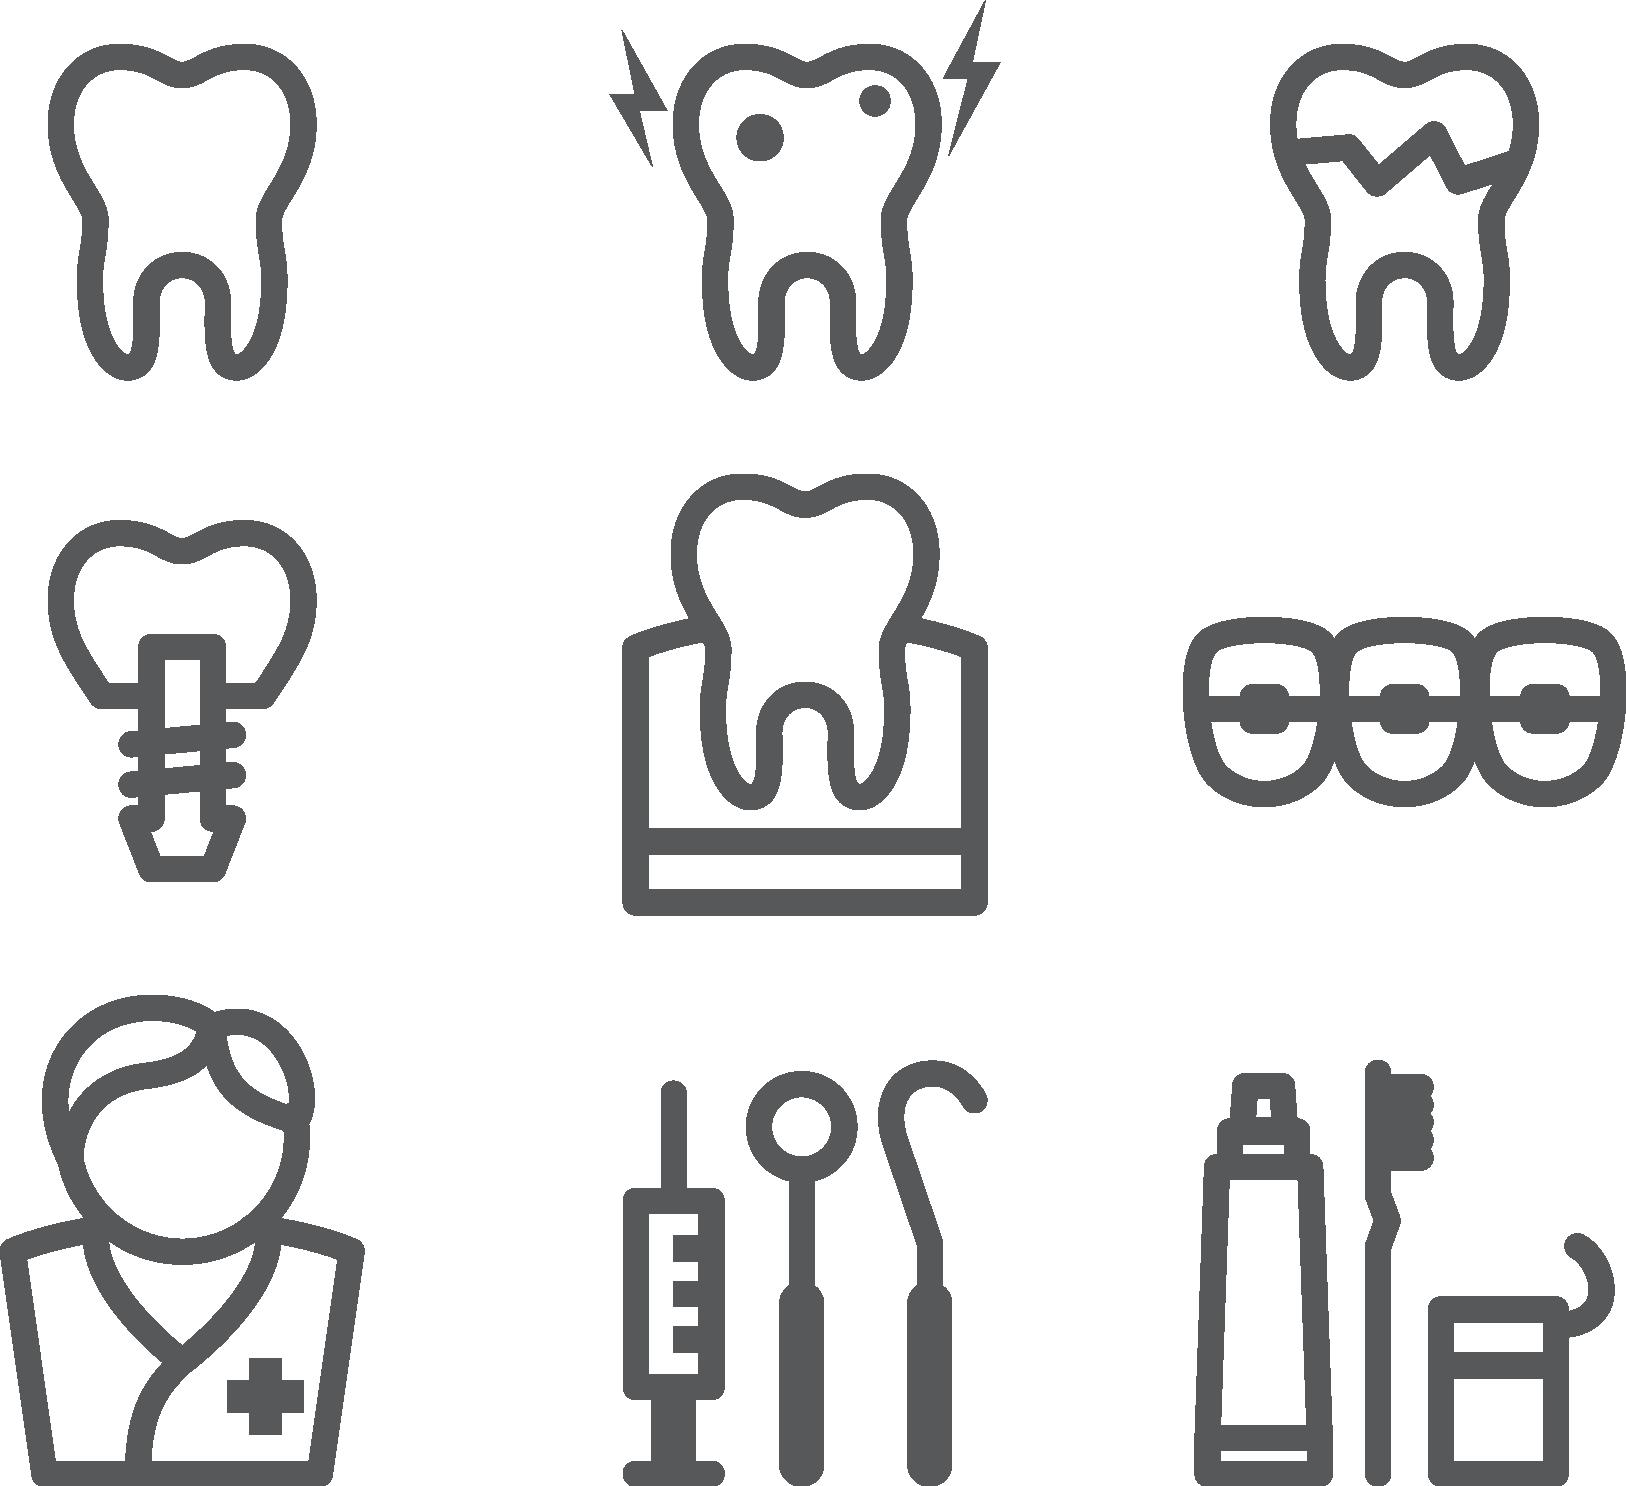 Dentist clipart border. Dentistry icon simple dental